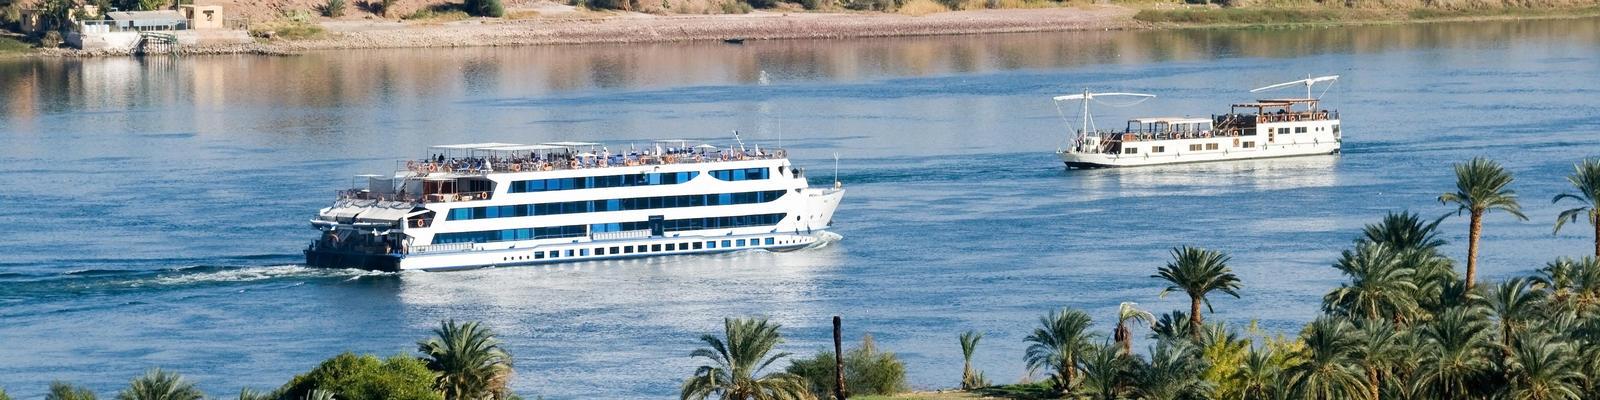 Cruise ship on the Nile River (Photo: erichon/Shutterstock.com)